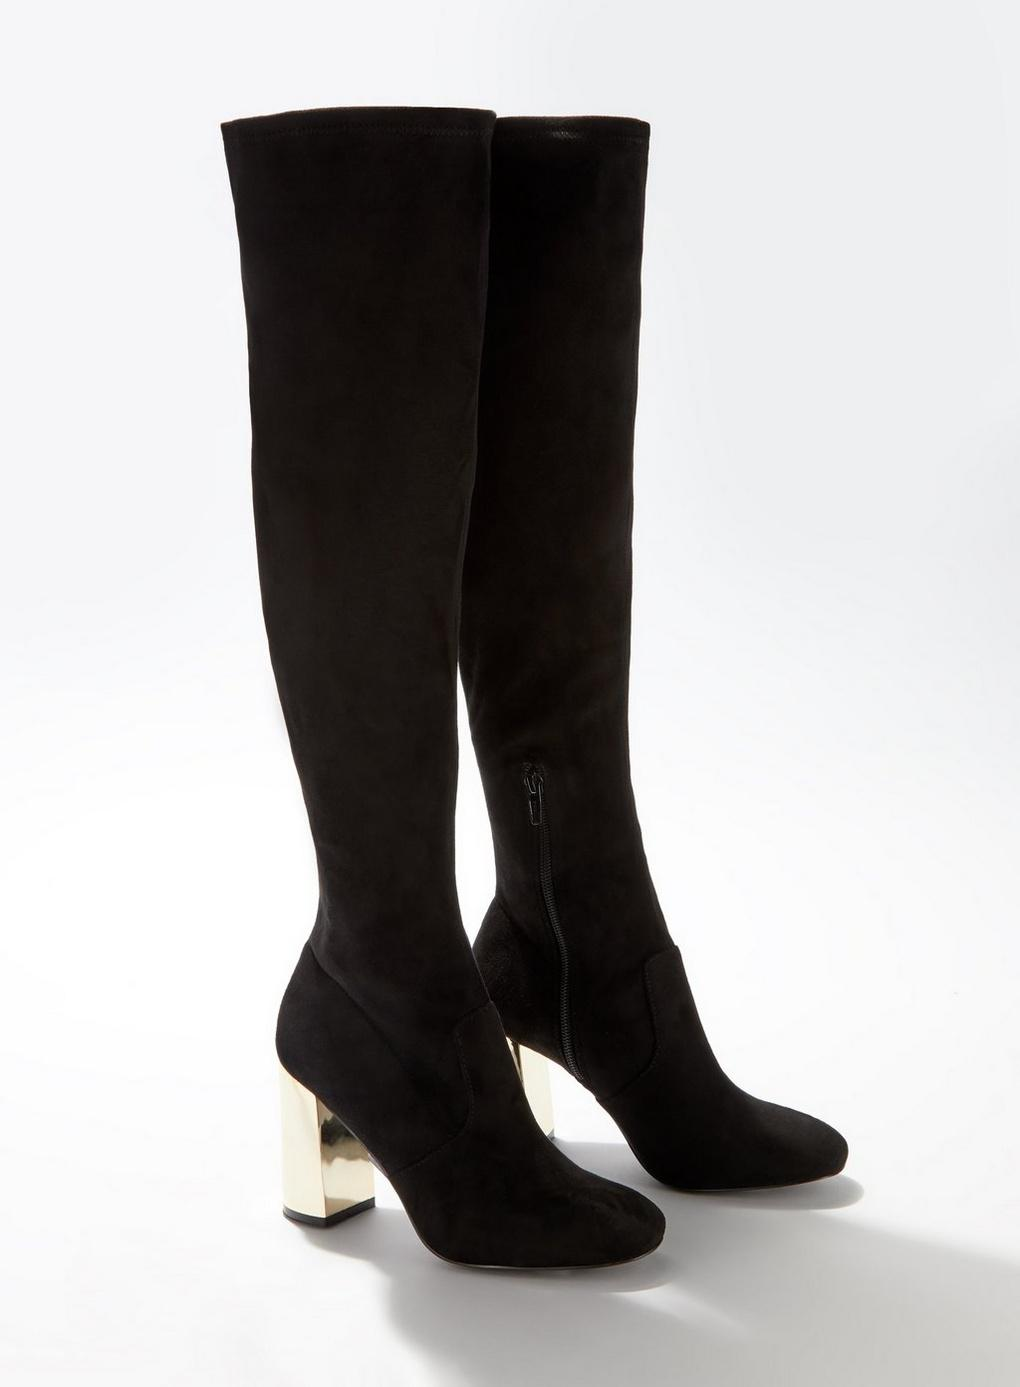 36ebb9949a7 Lyst - Miss Selfridge Olivia Black Over The Knee Boots in Black